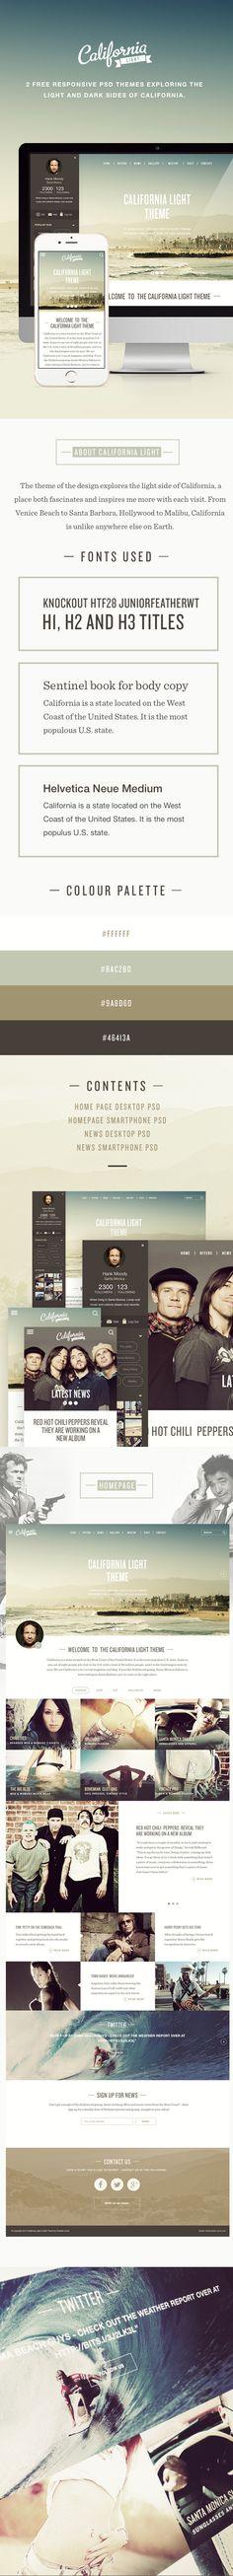 California Light & Dark FREE PSD themes on Behance